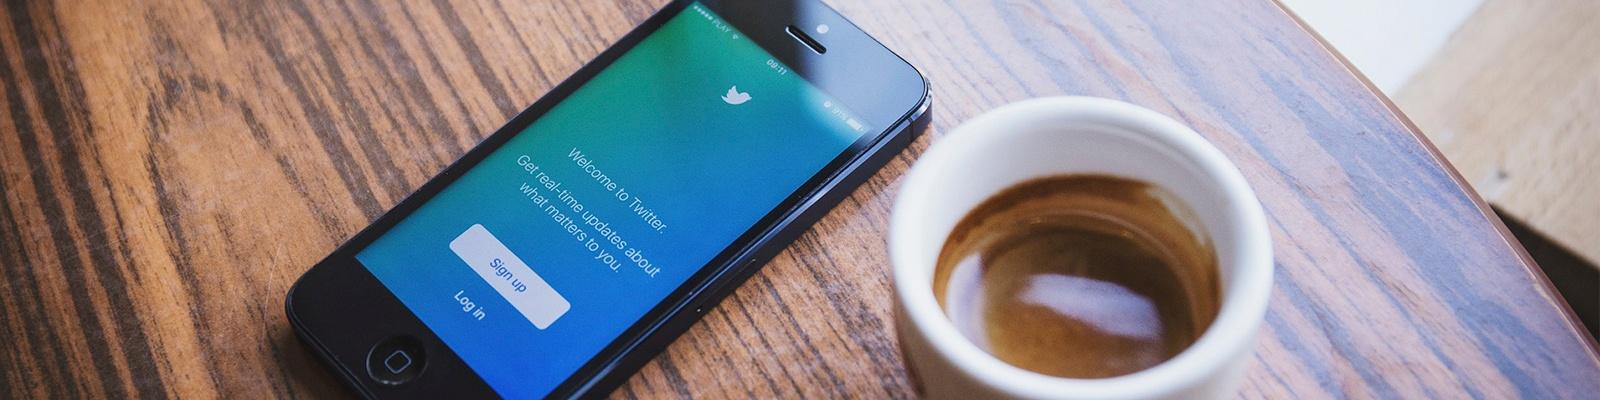 9 tendencias de Social Media para 2017